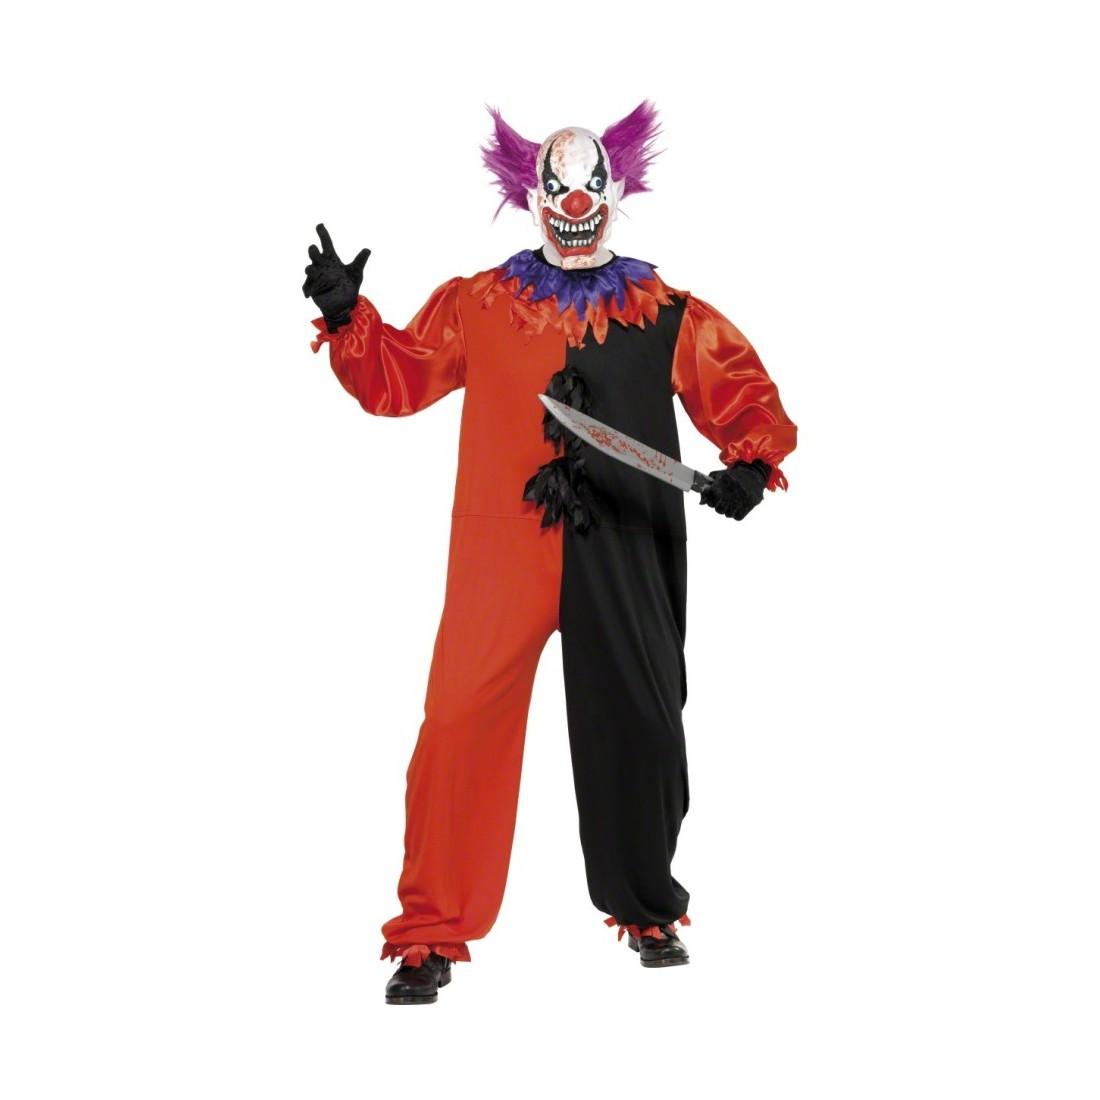 bobo clownkost m grusel clown kost m orange wei s 44 46 clownskost m horrorclown clown kost m. Black Bedroom Furniture Sets. Home Design Ideas